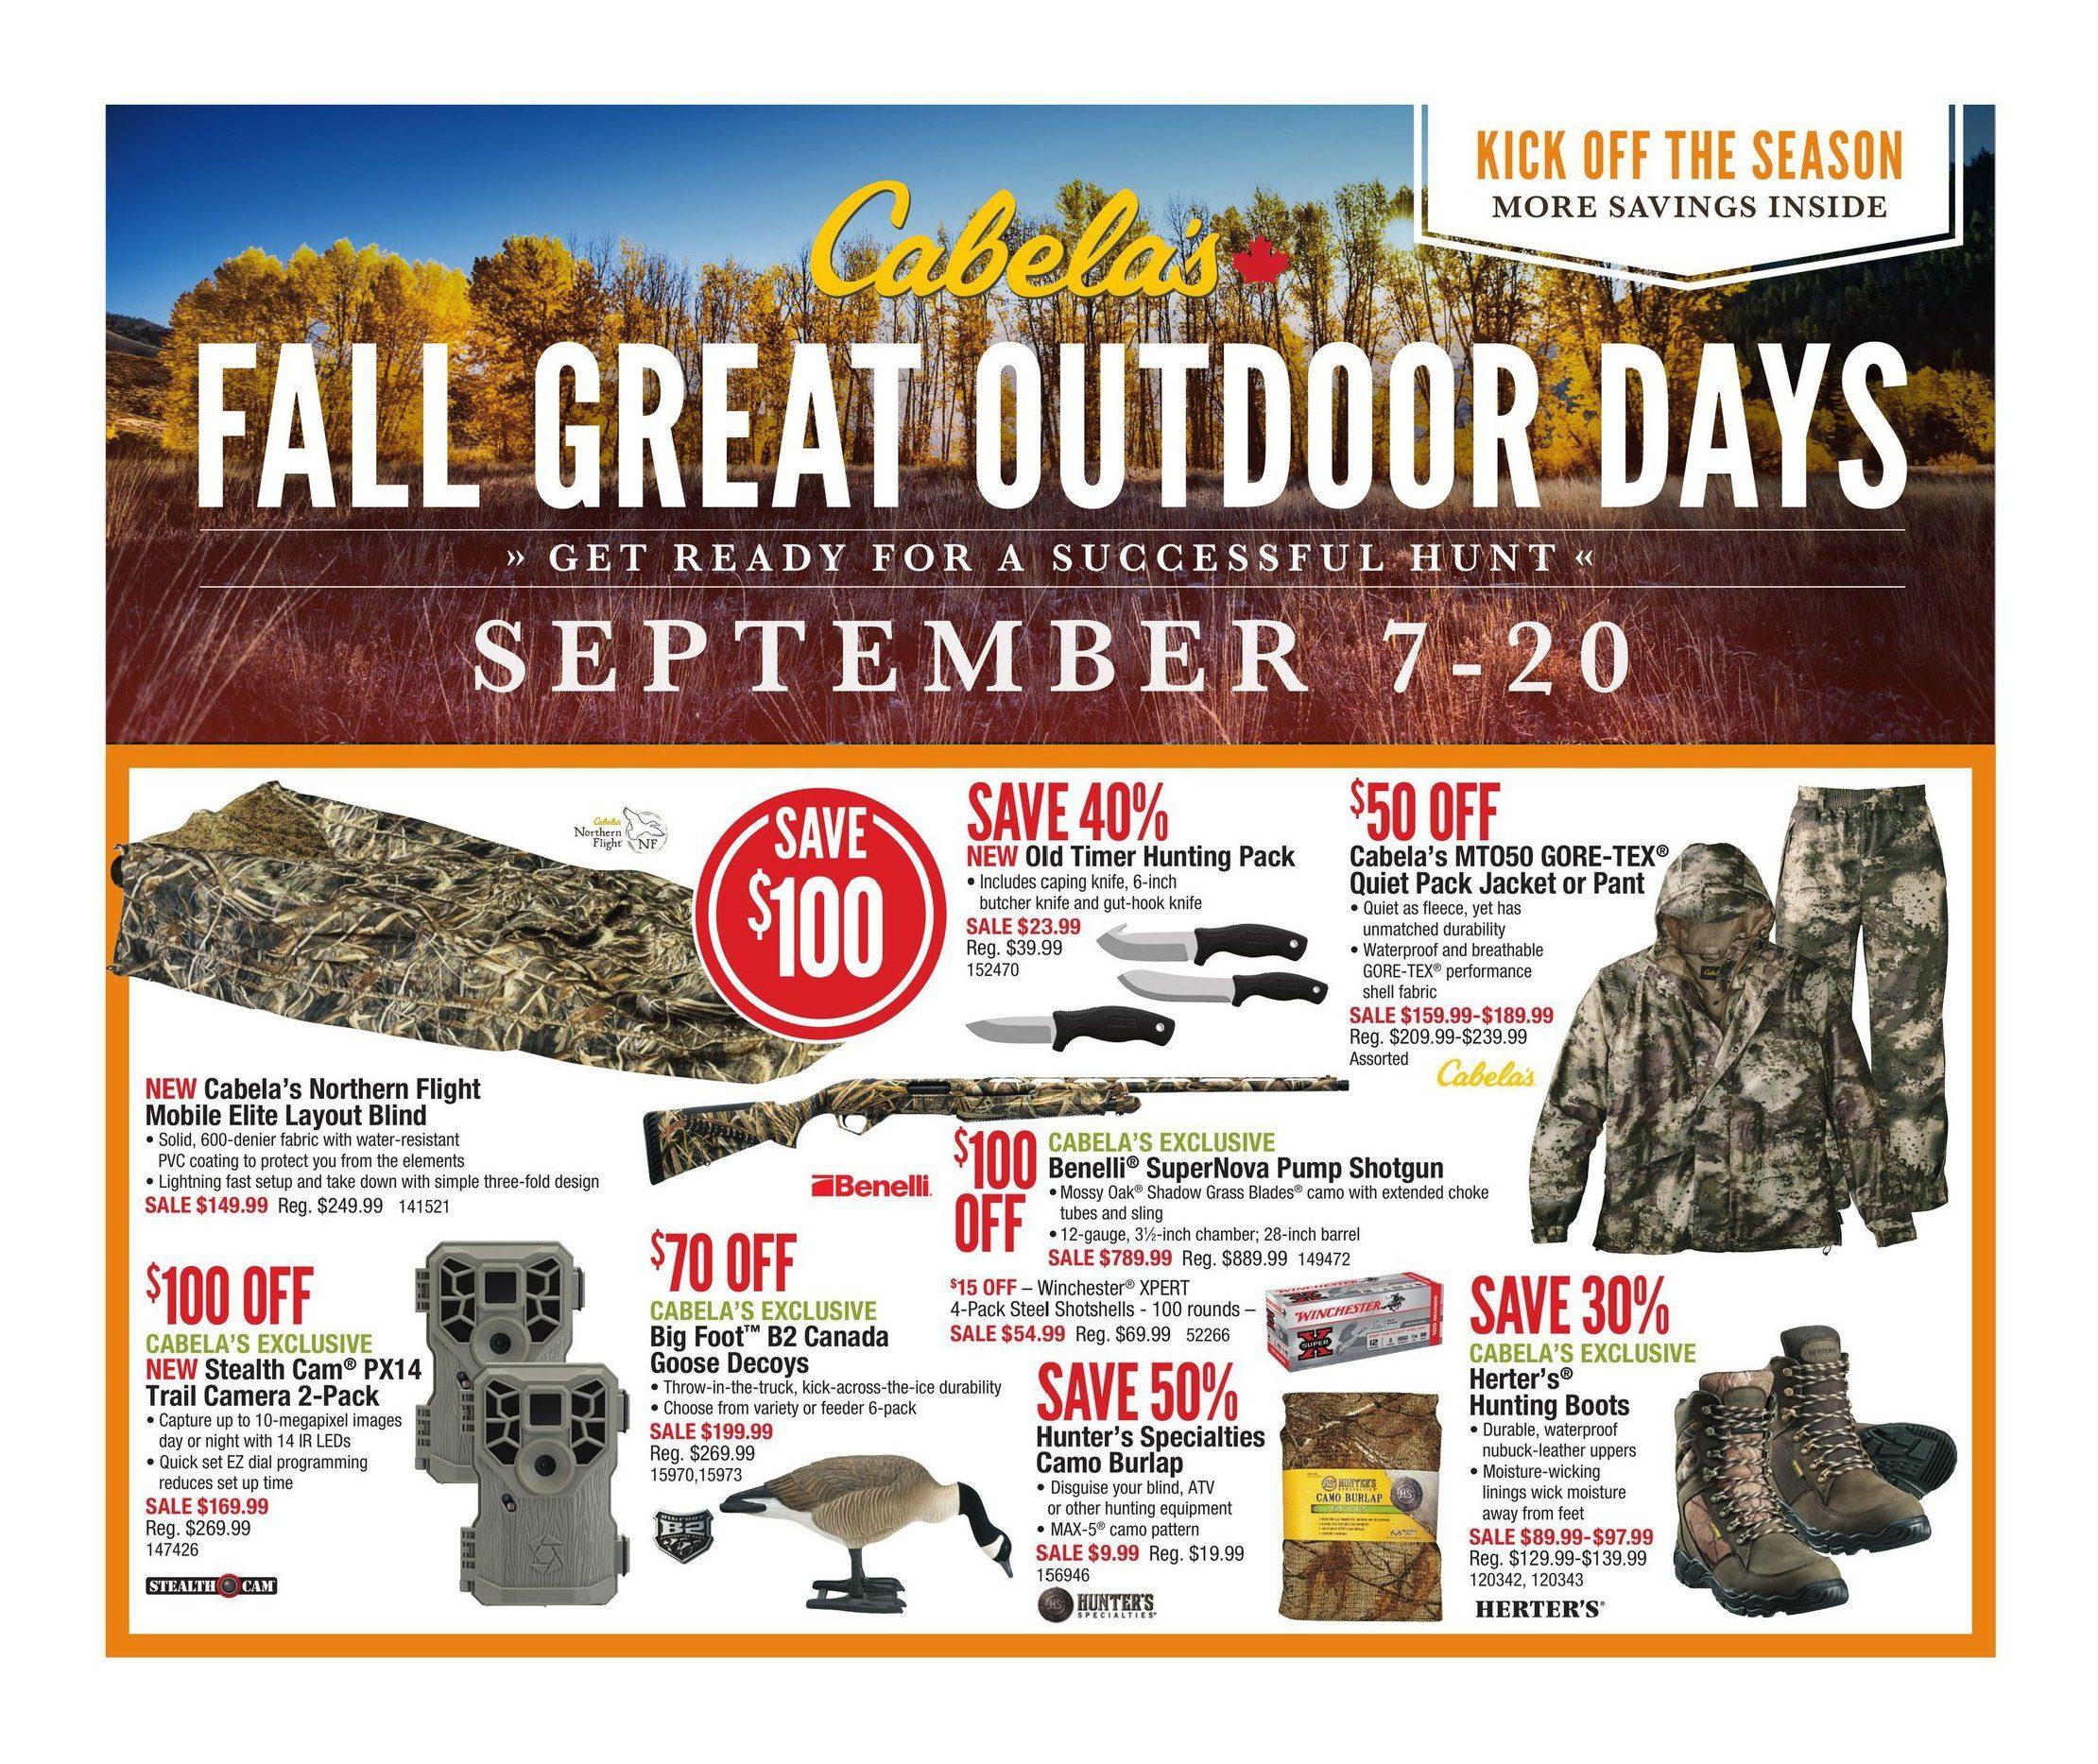 dedb214224196 Cabelas Weekly Flyer - Fall Great Outdoor Days - Sep 7 – 20 -  RedFlagDeals.com